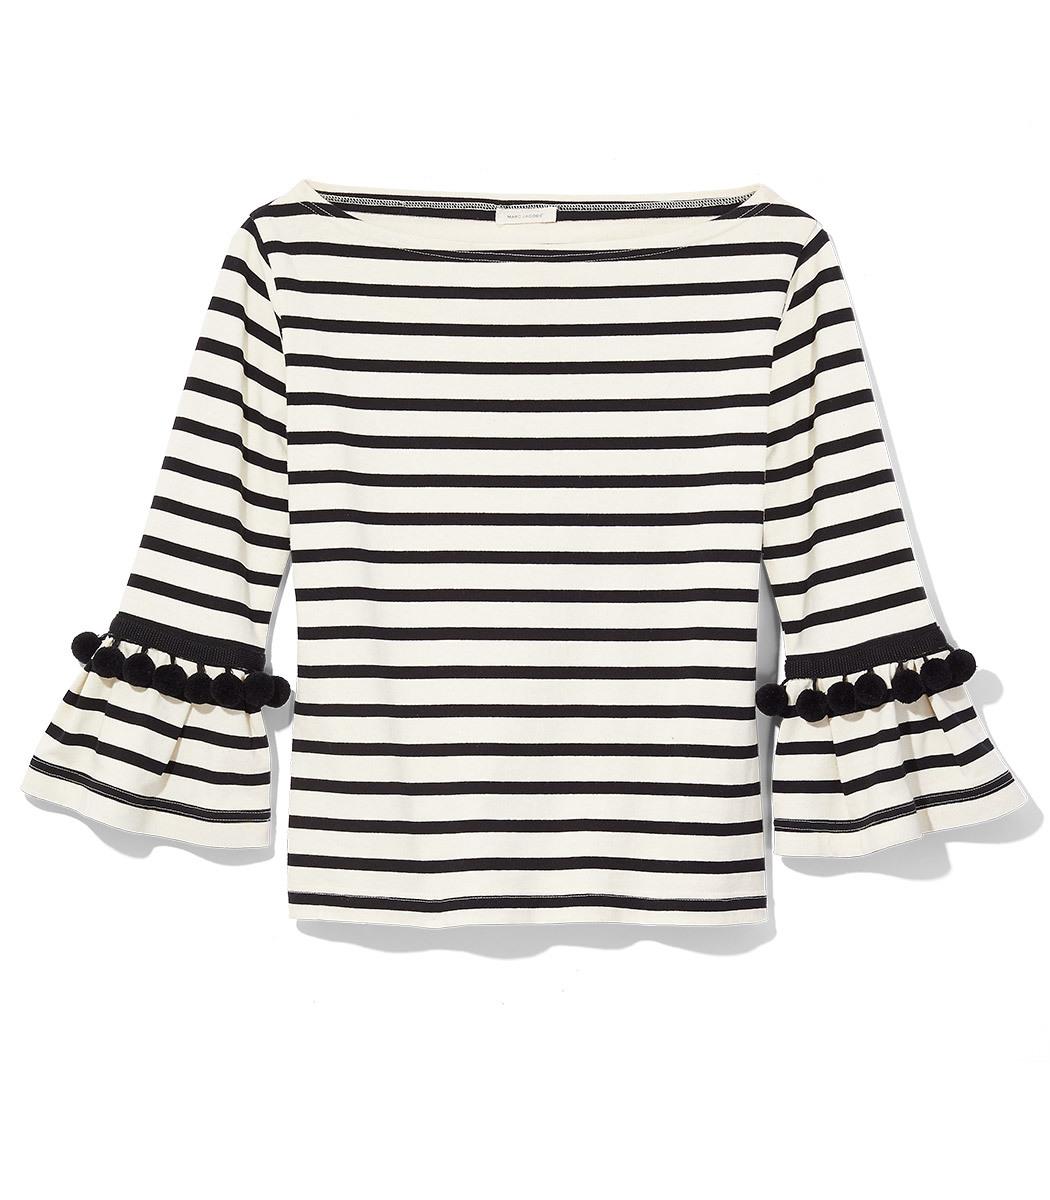 Pompom-Embellished Striped Cotton-Jersey Top in Black